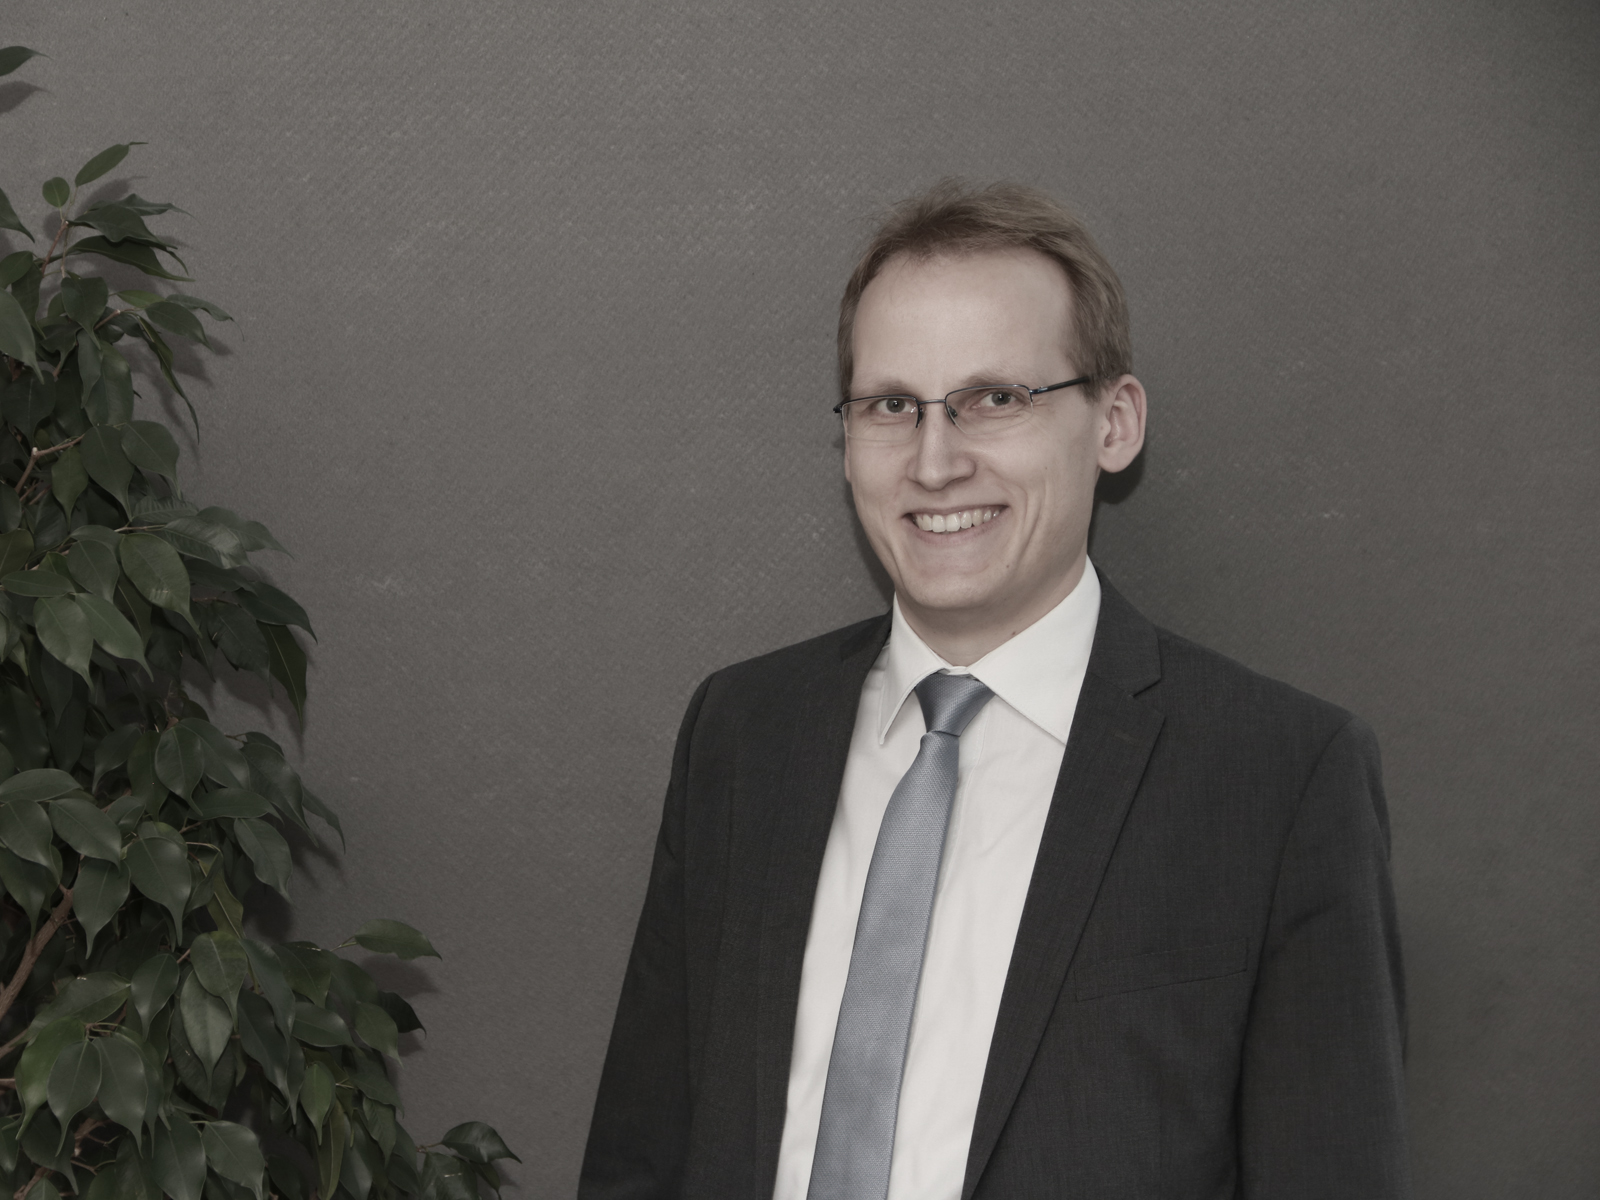 Porträt Bürgermeister Magnus Hoppe